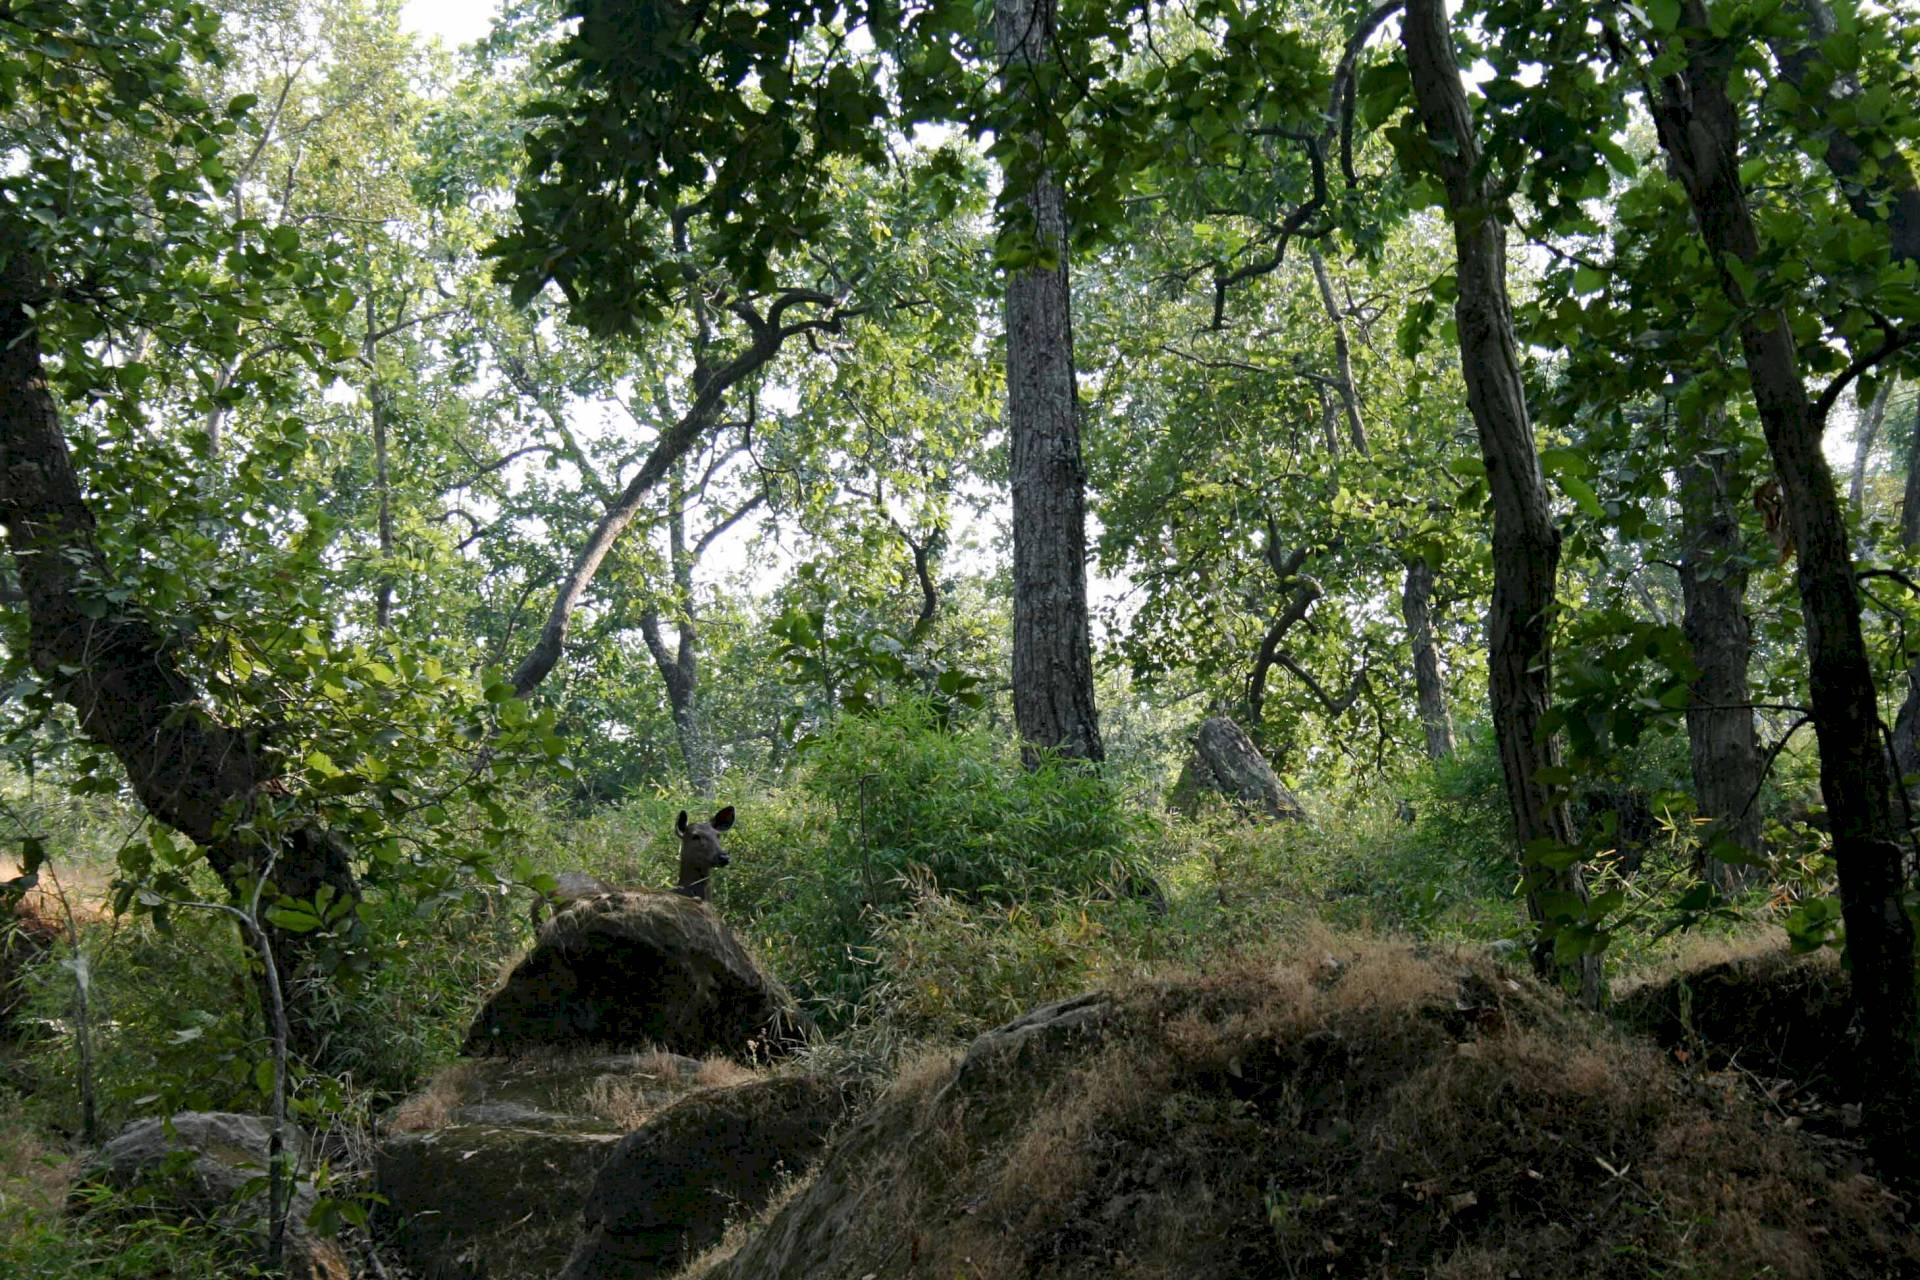 Bandhavgahr-Tala